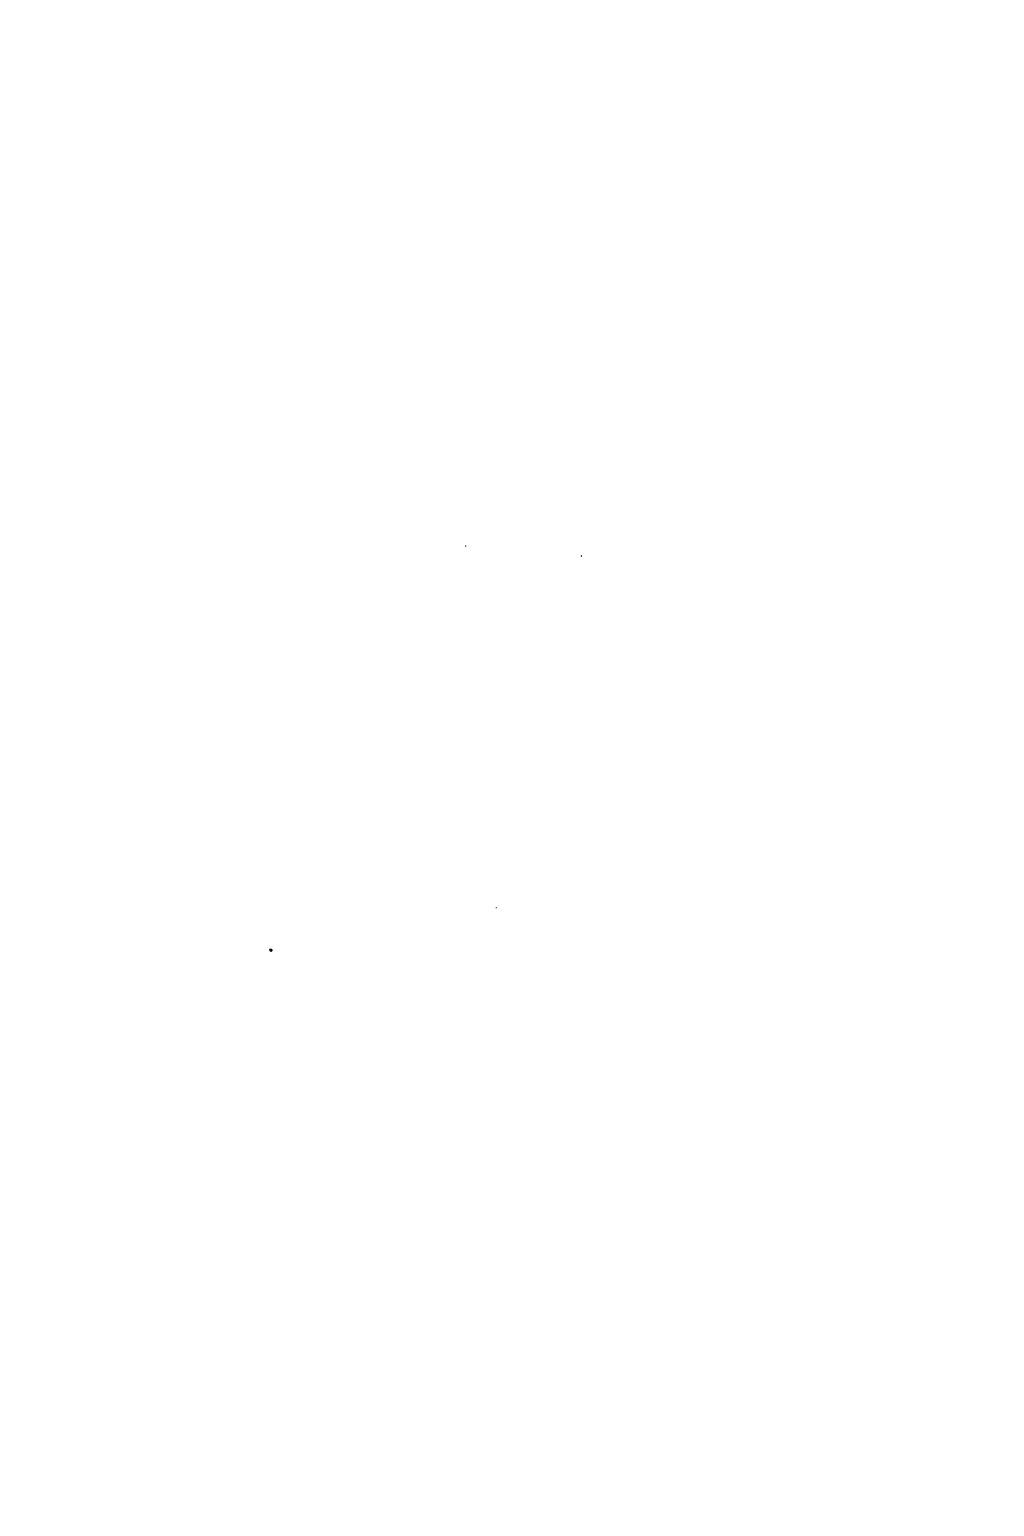 Pageberrichon Jean Arthur Rimbaud 1912djvu131 Wikisource